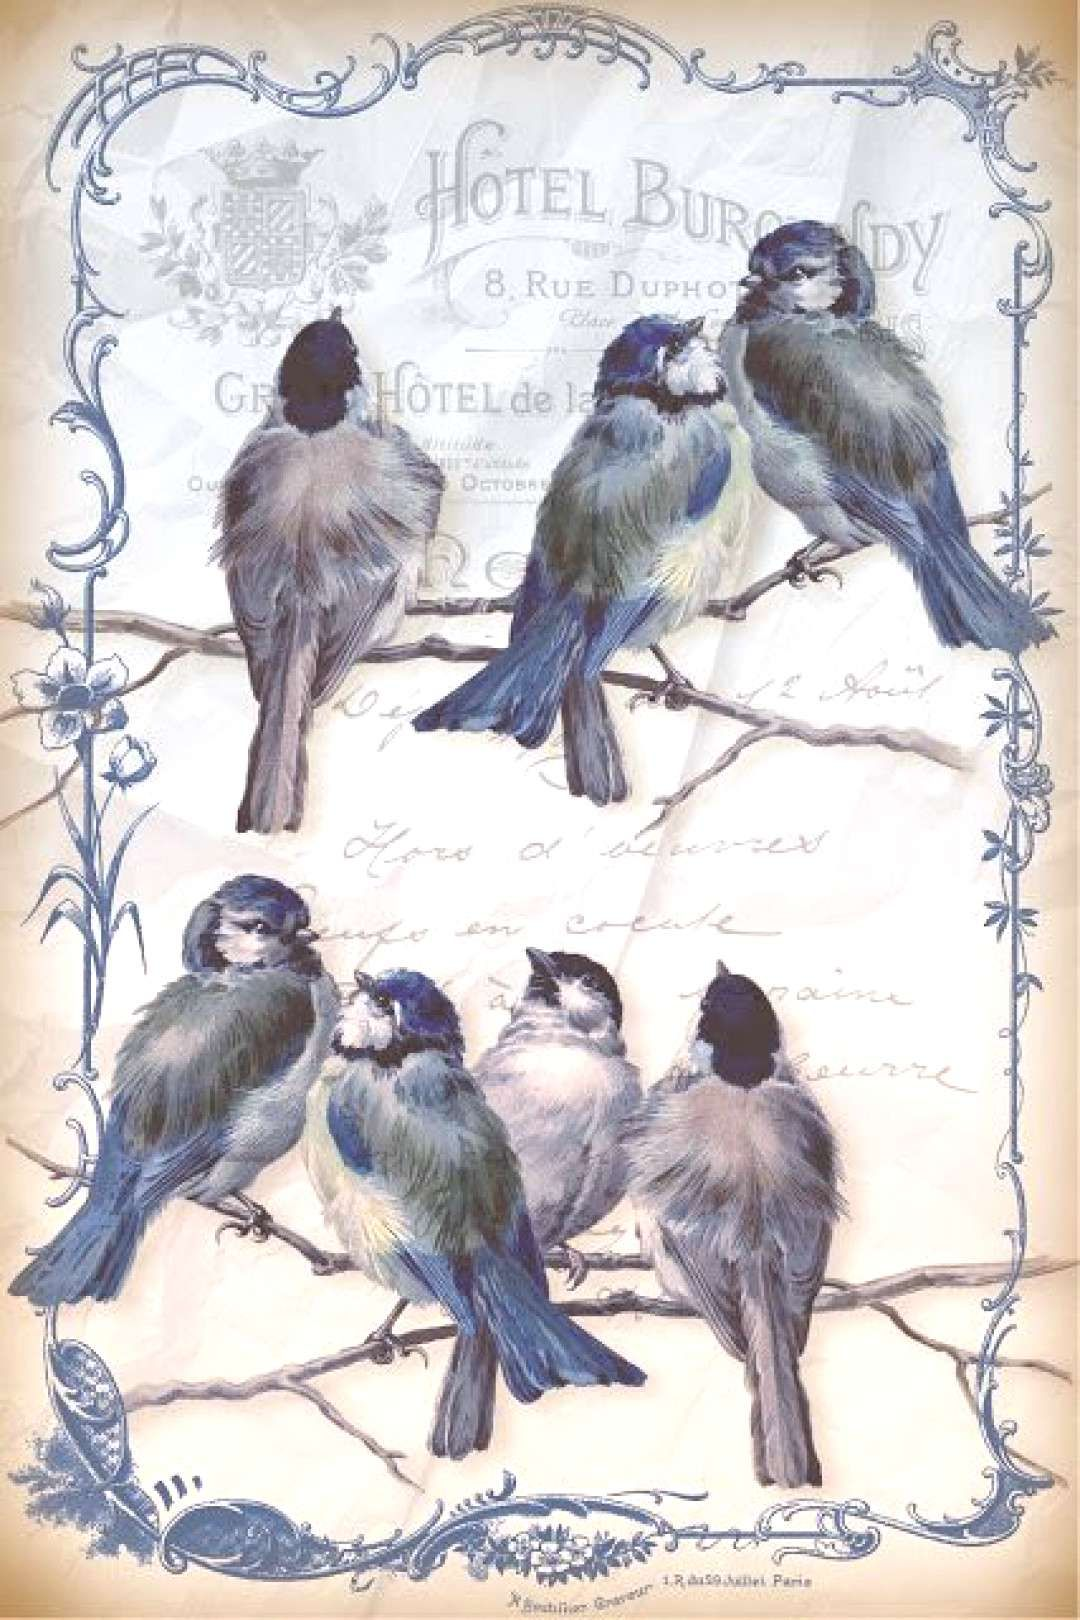 birds Bird journaling cards bird ephemera black and white altered index cards journaling cards Bird embellishments